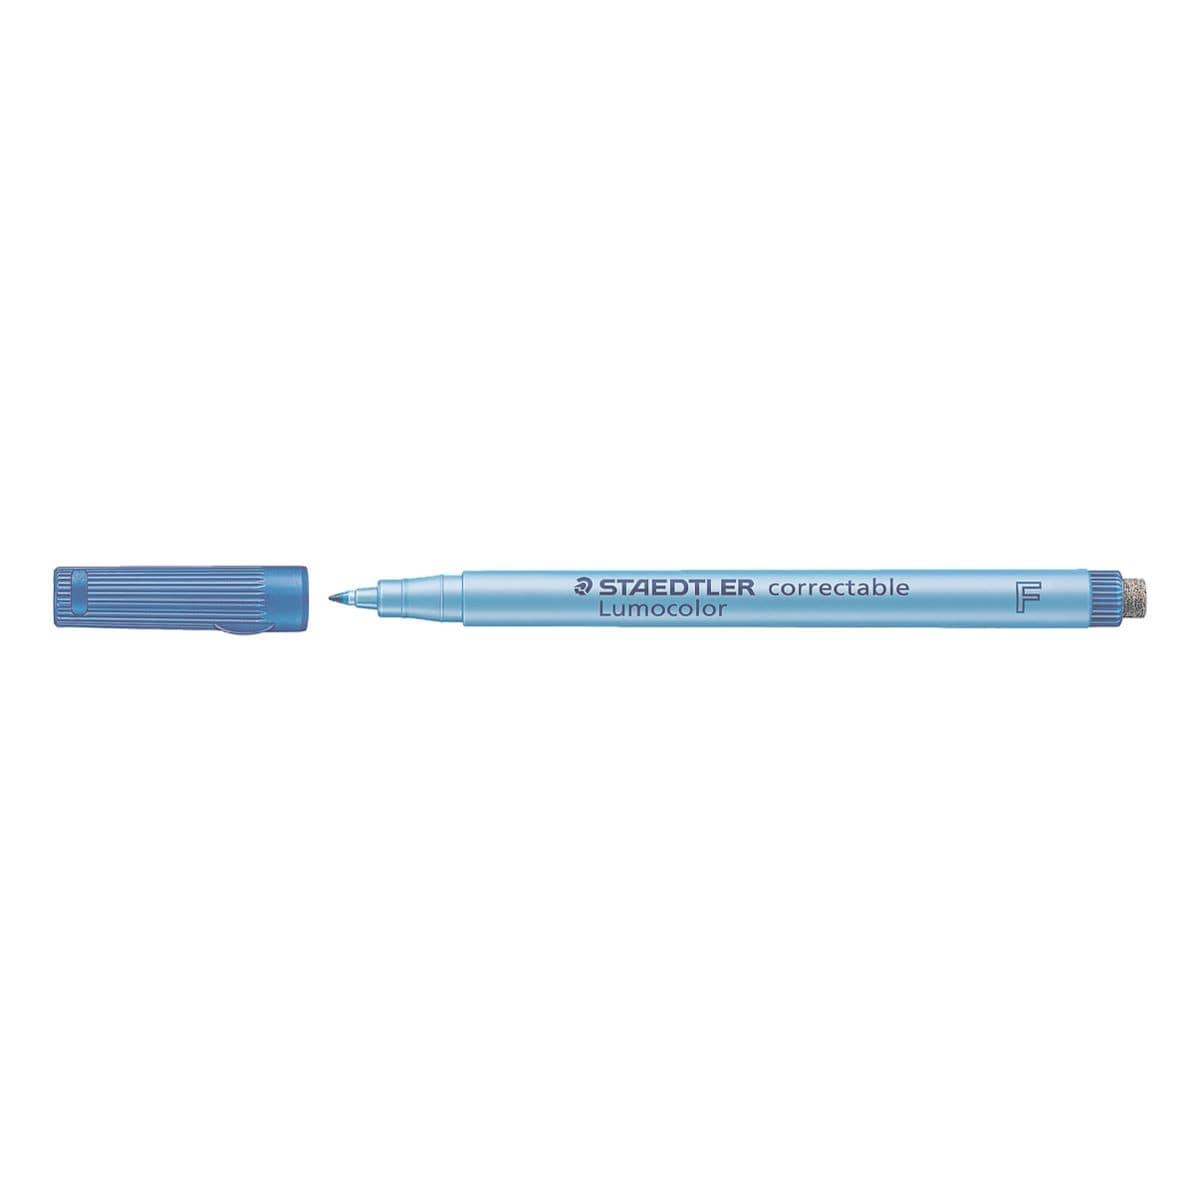 STAEDTLER Universalstift Lumocolor correctable - Rundspitze, Strichstärke 0,6 mm (F)